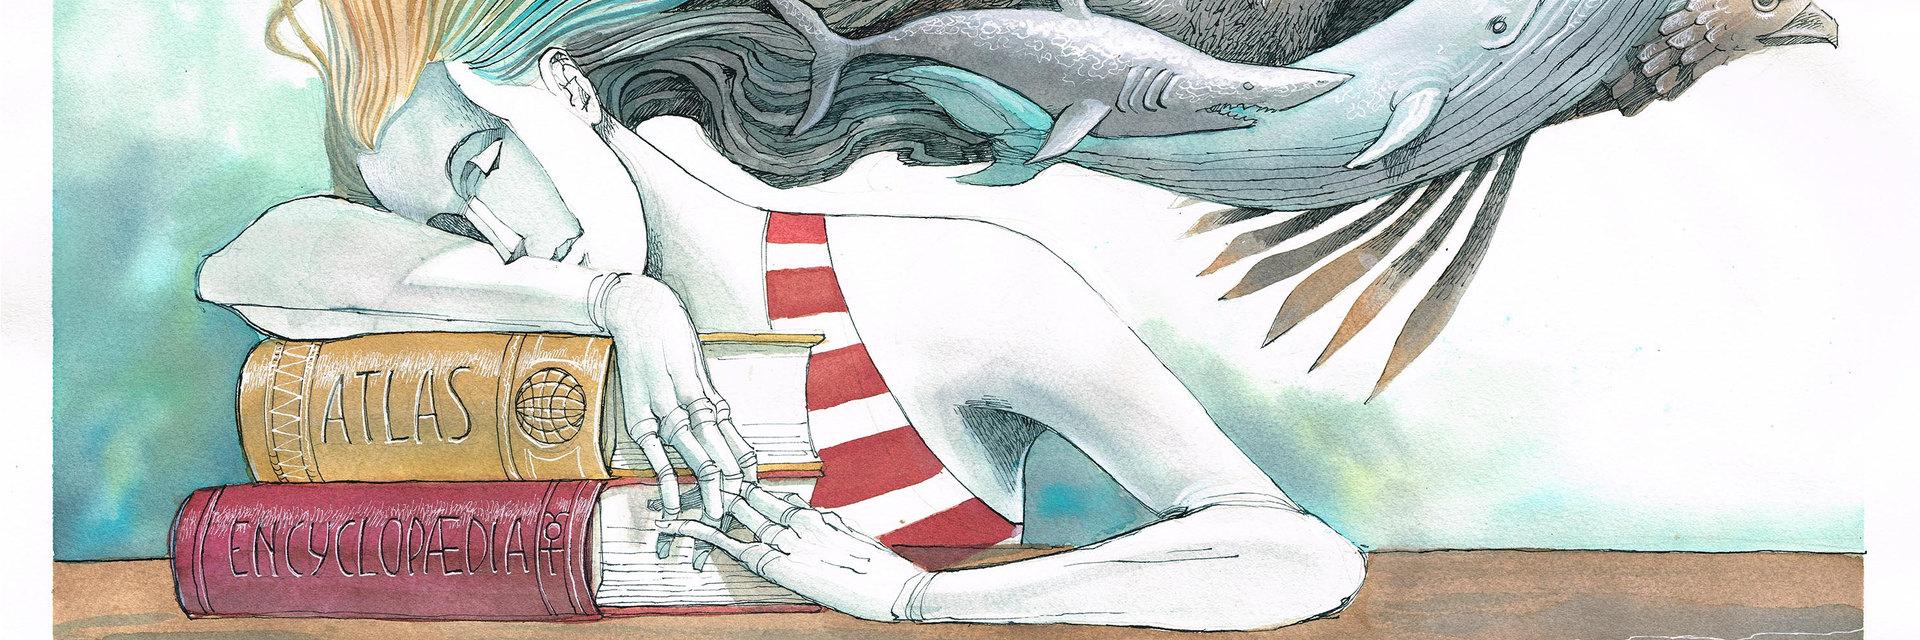 "Illustations for the magazine ""Illustrati"""